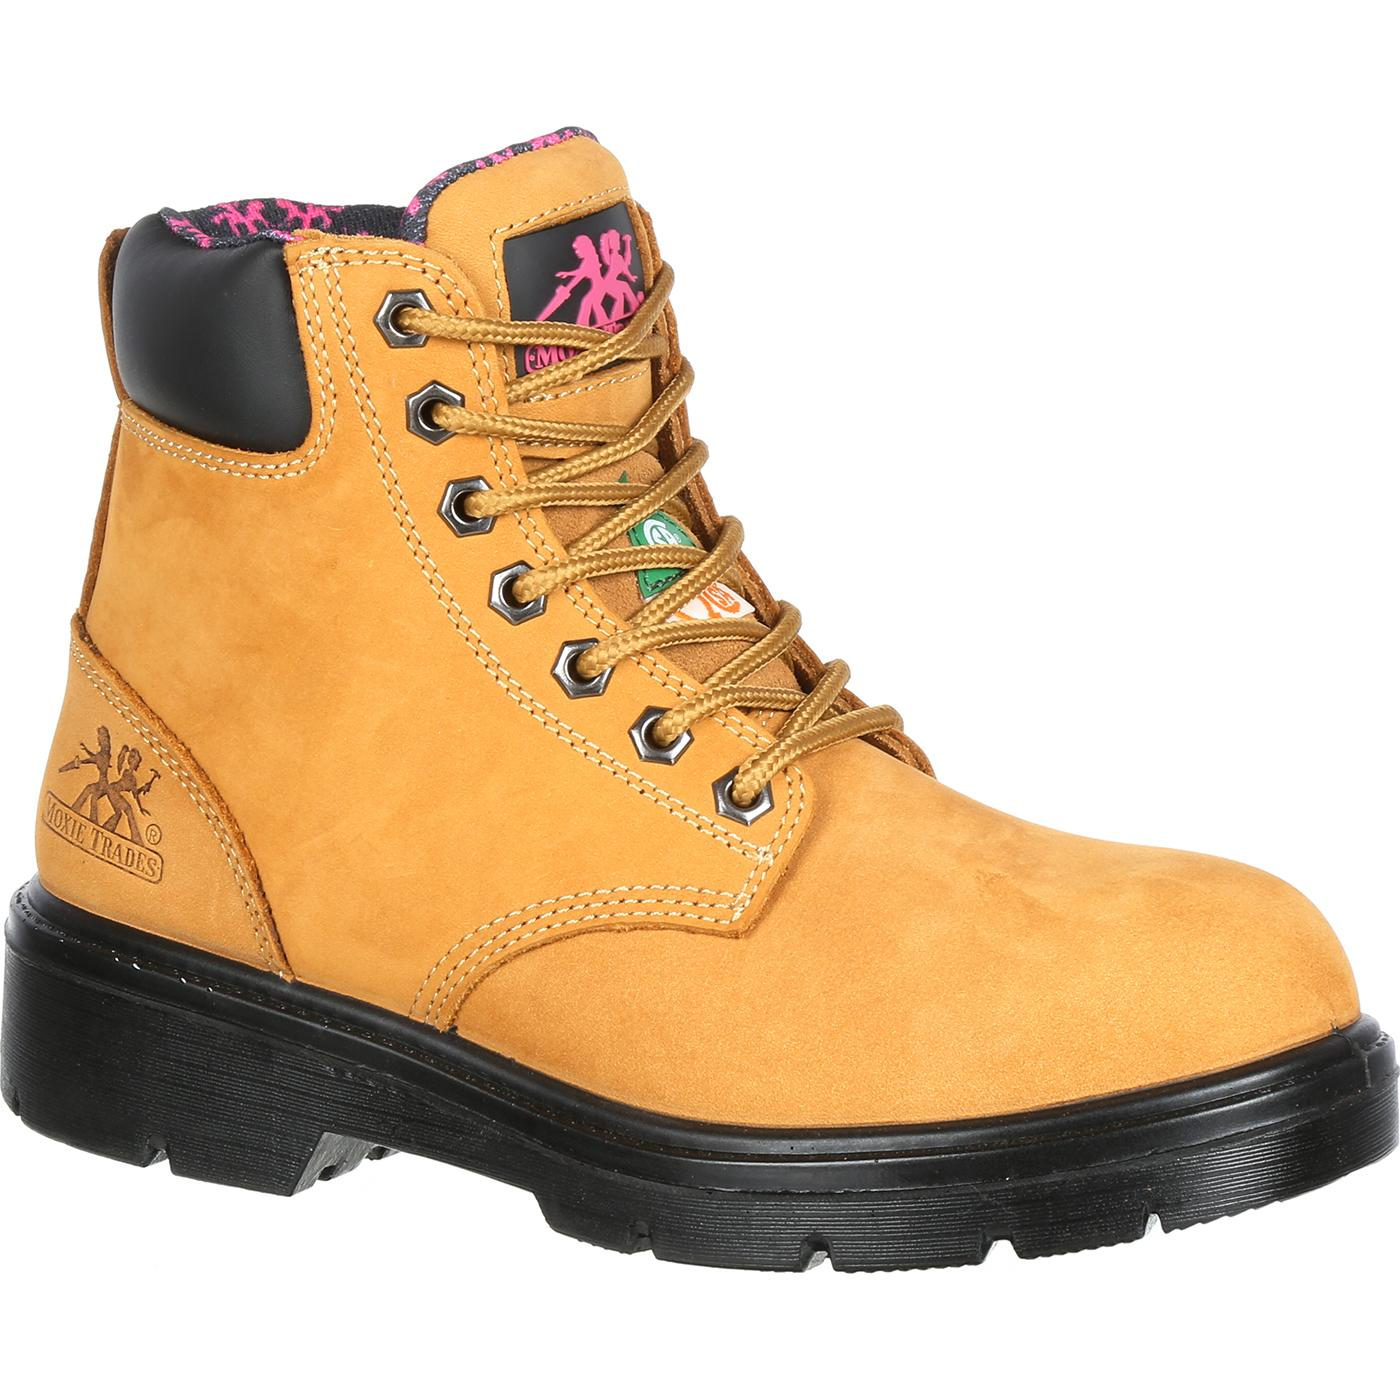 Moxie Trades Alice Steel Toe Work Boot (Women's) i9aiikkd